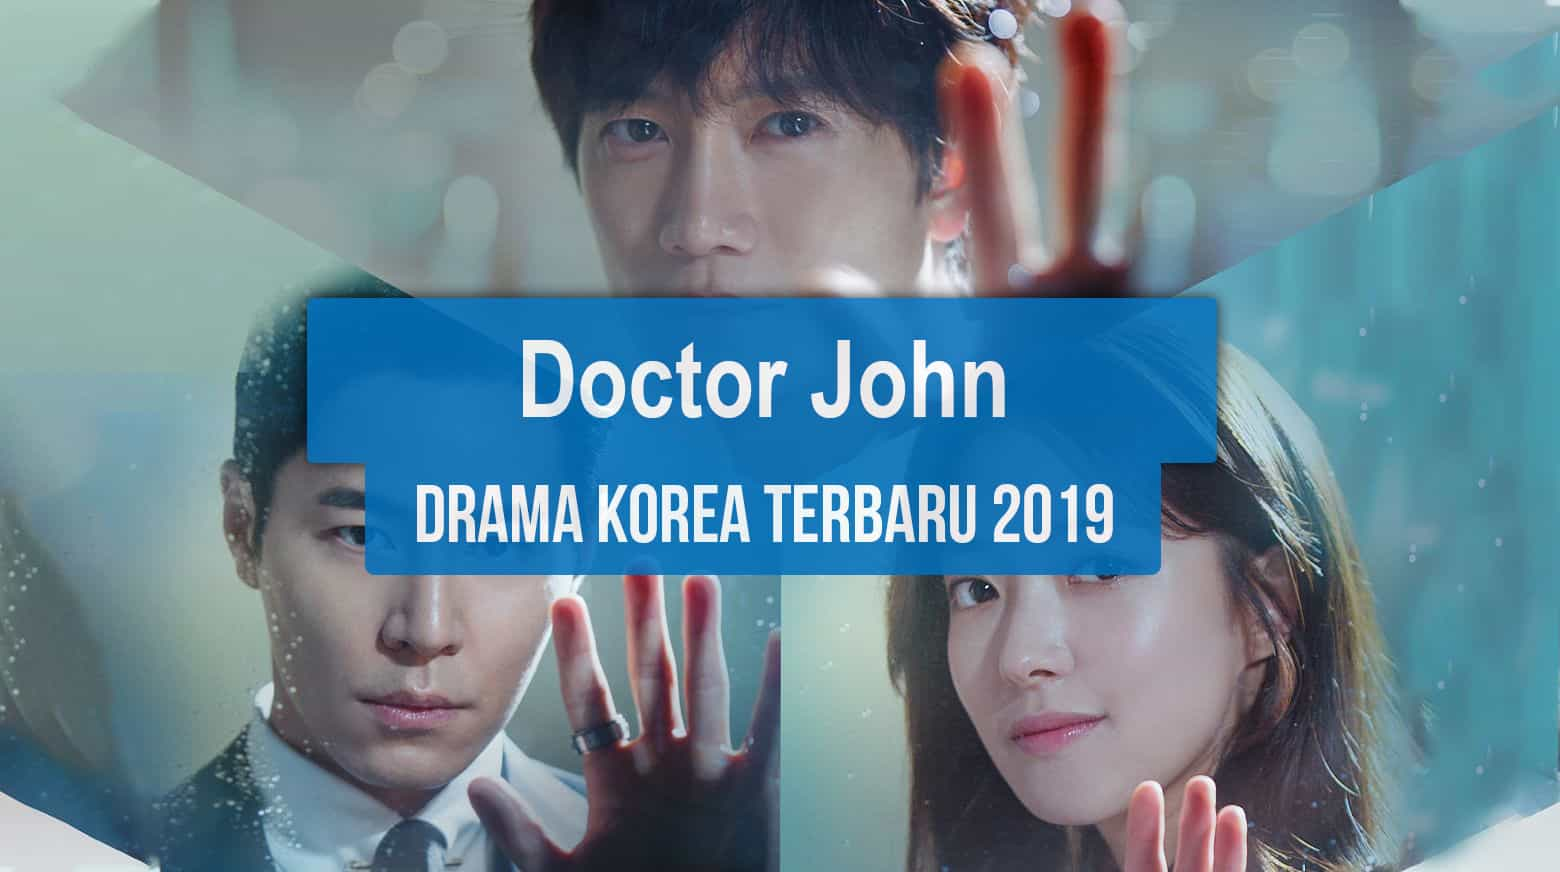 Sinopsis Tanggal Rilis Jadwal Drama Korea Doctor John Bahasa Indonesia